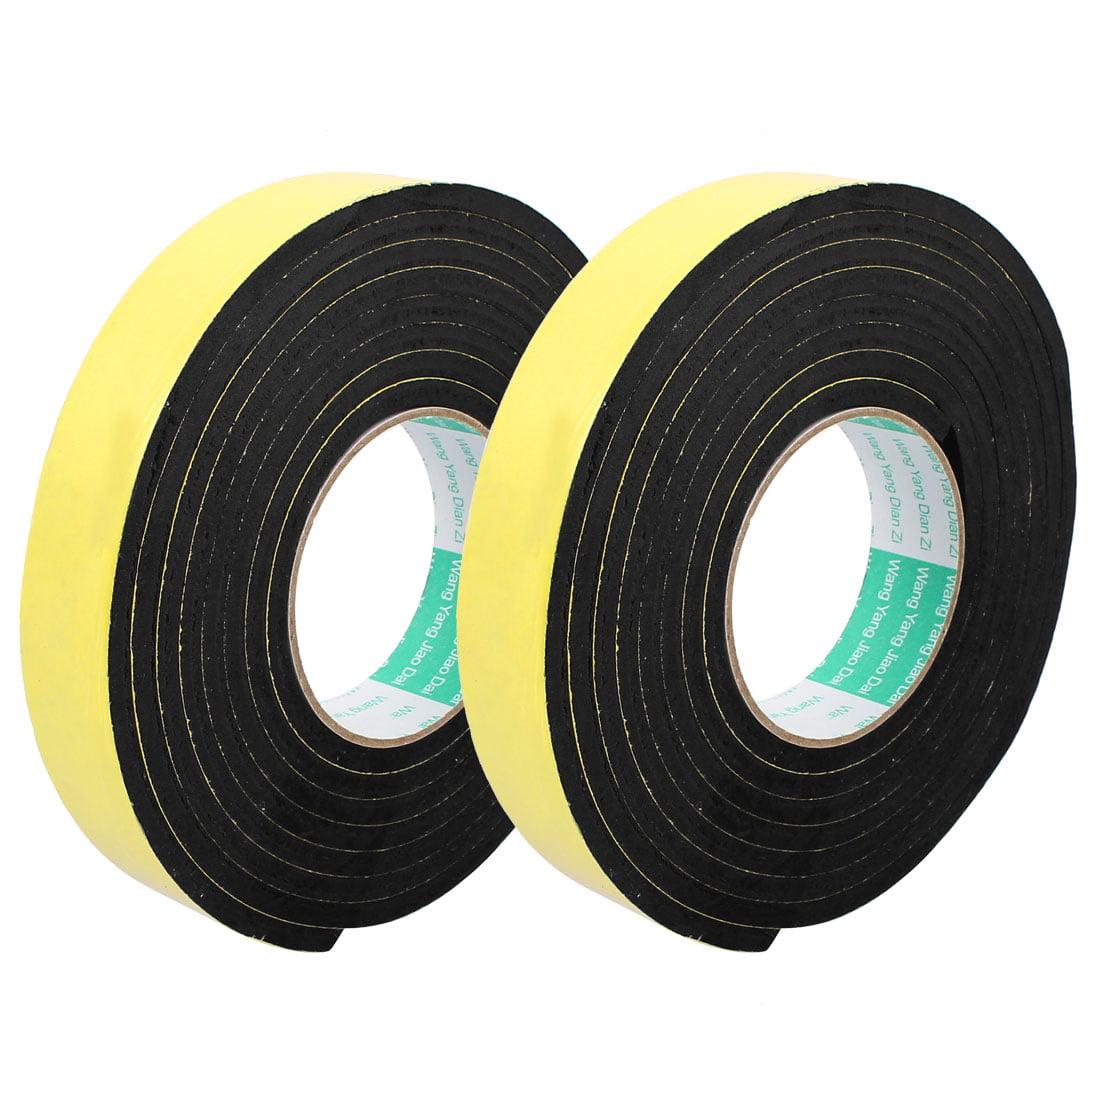 30mm Width Single Side Self Adhesive Shockproof Sponge Foam Tape 2M Length 2Pcs